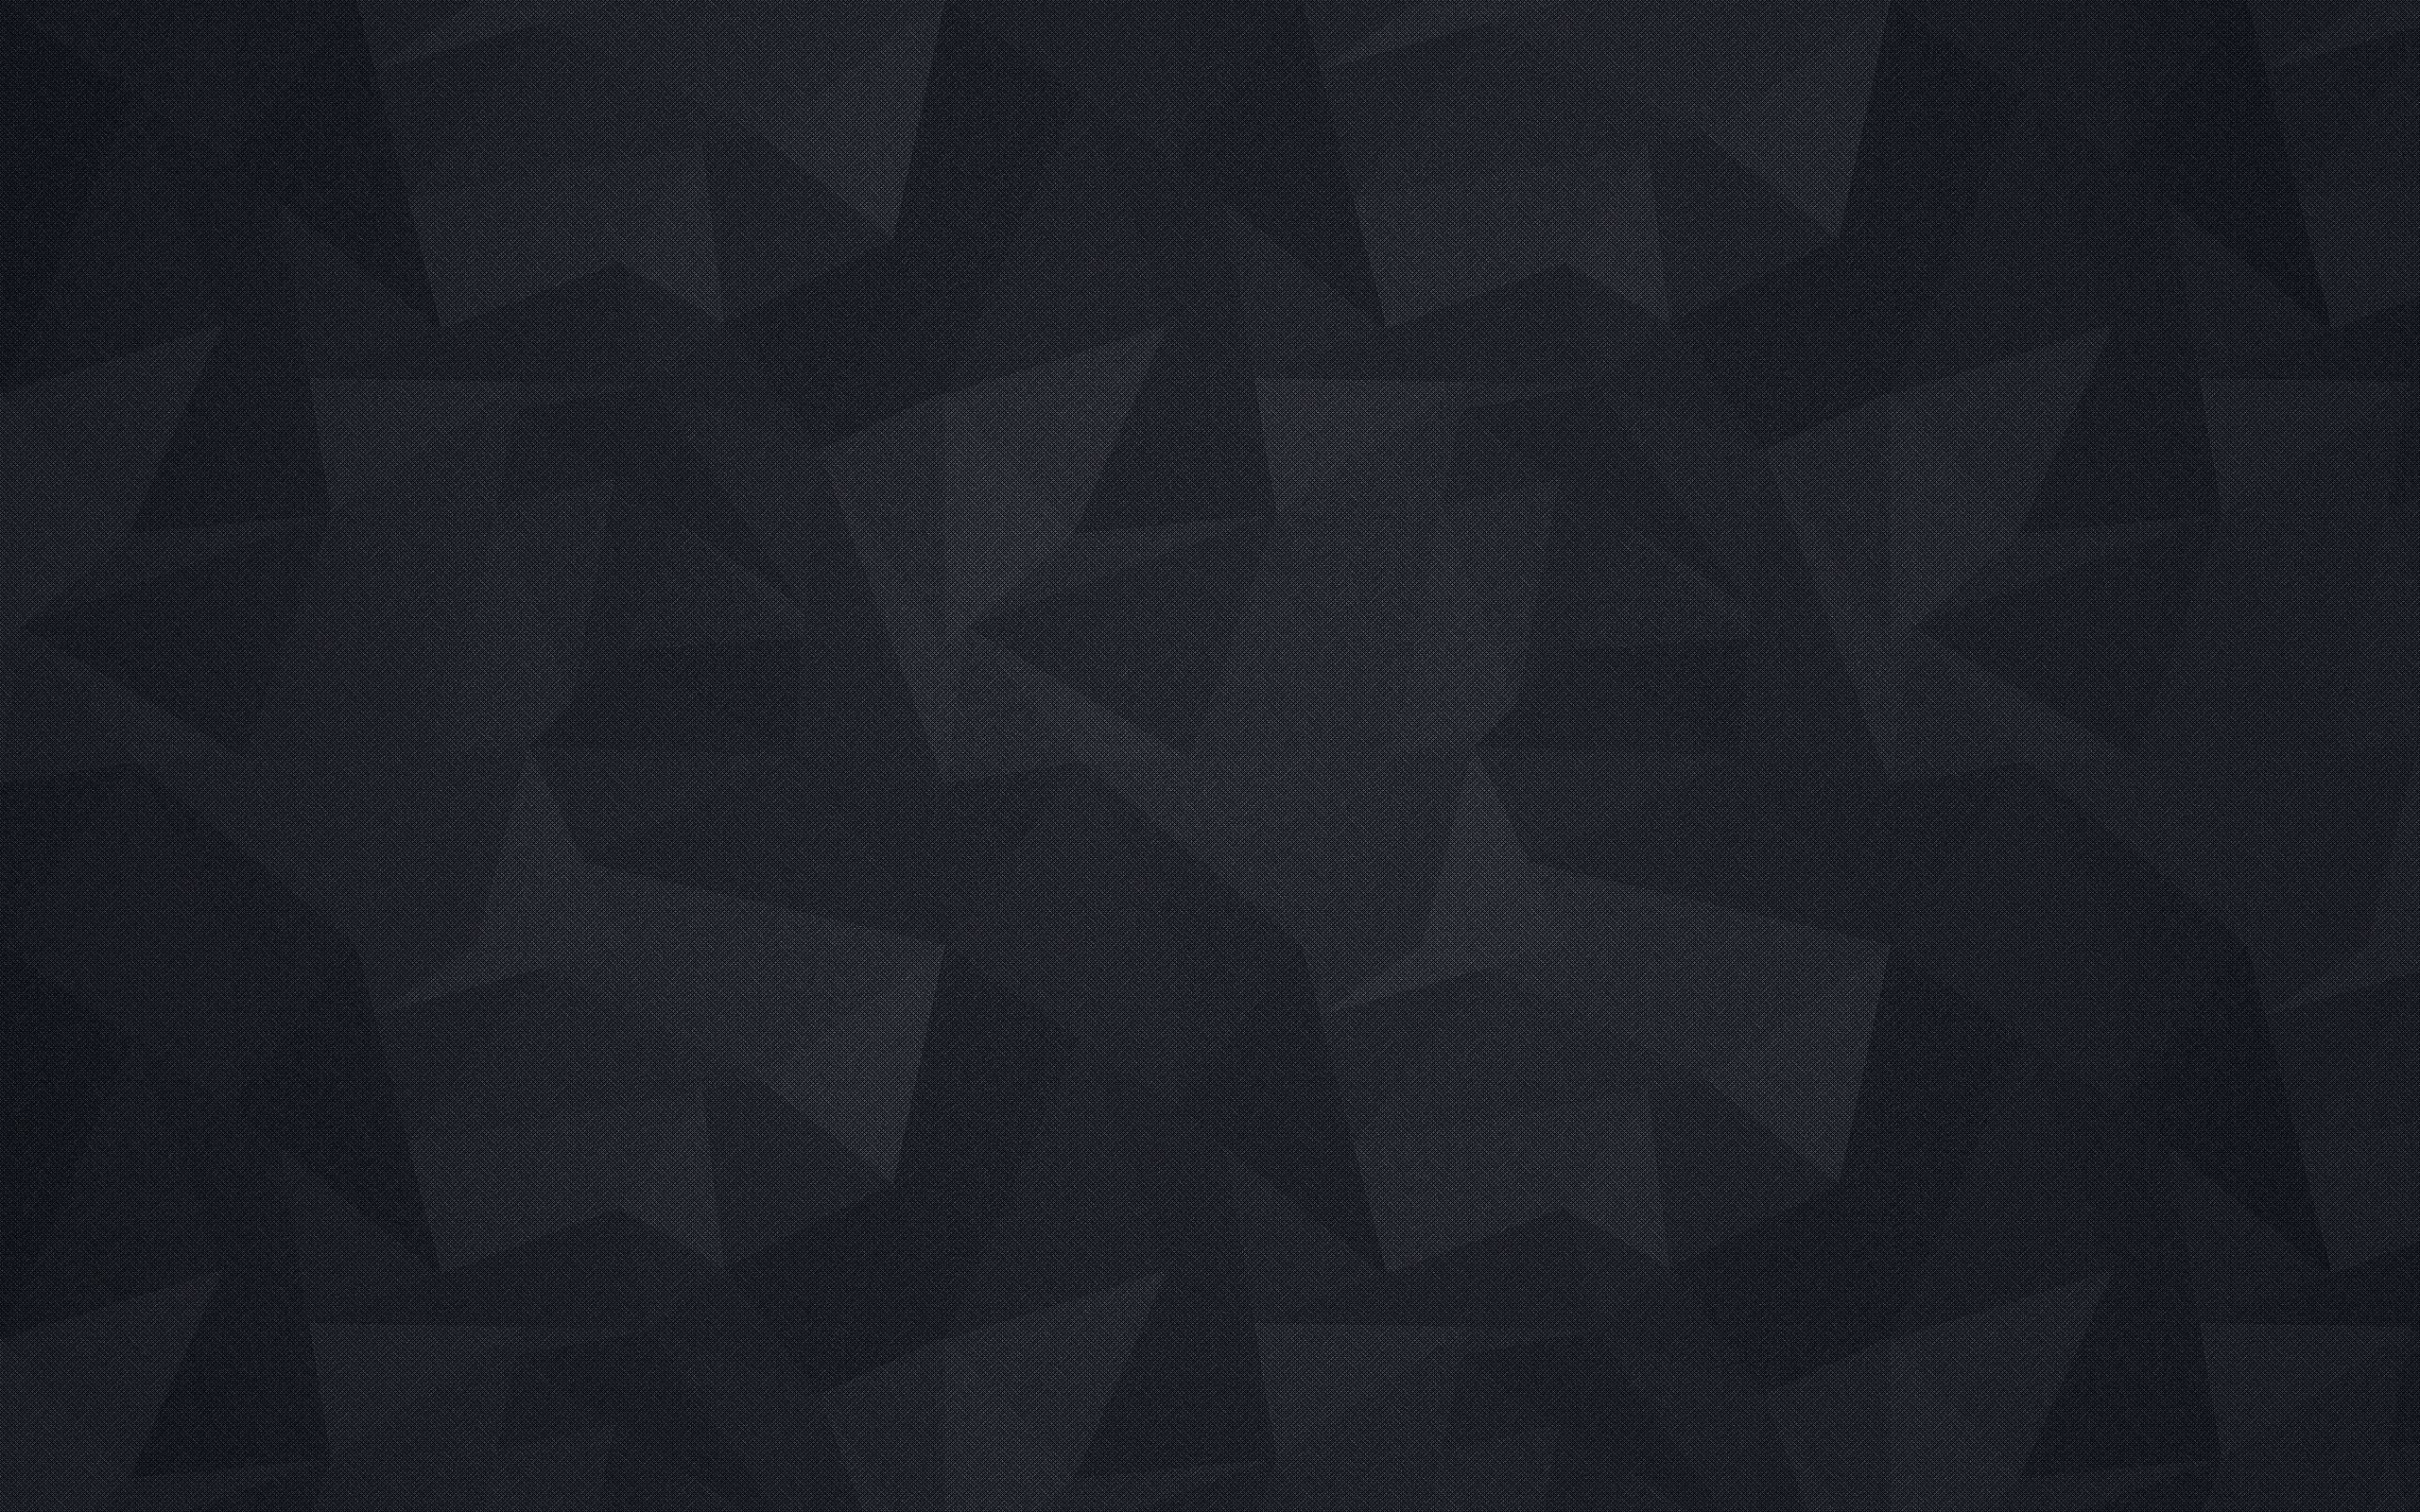 71+ Matte Black Wallpaper on WallpaperSafari